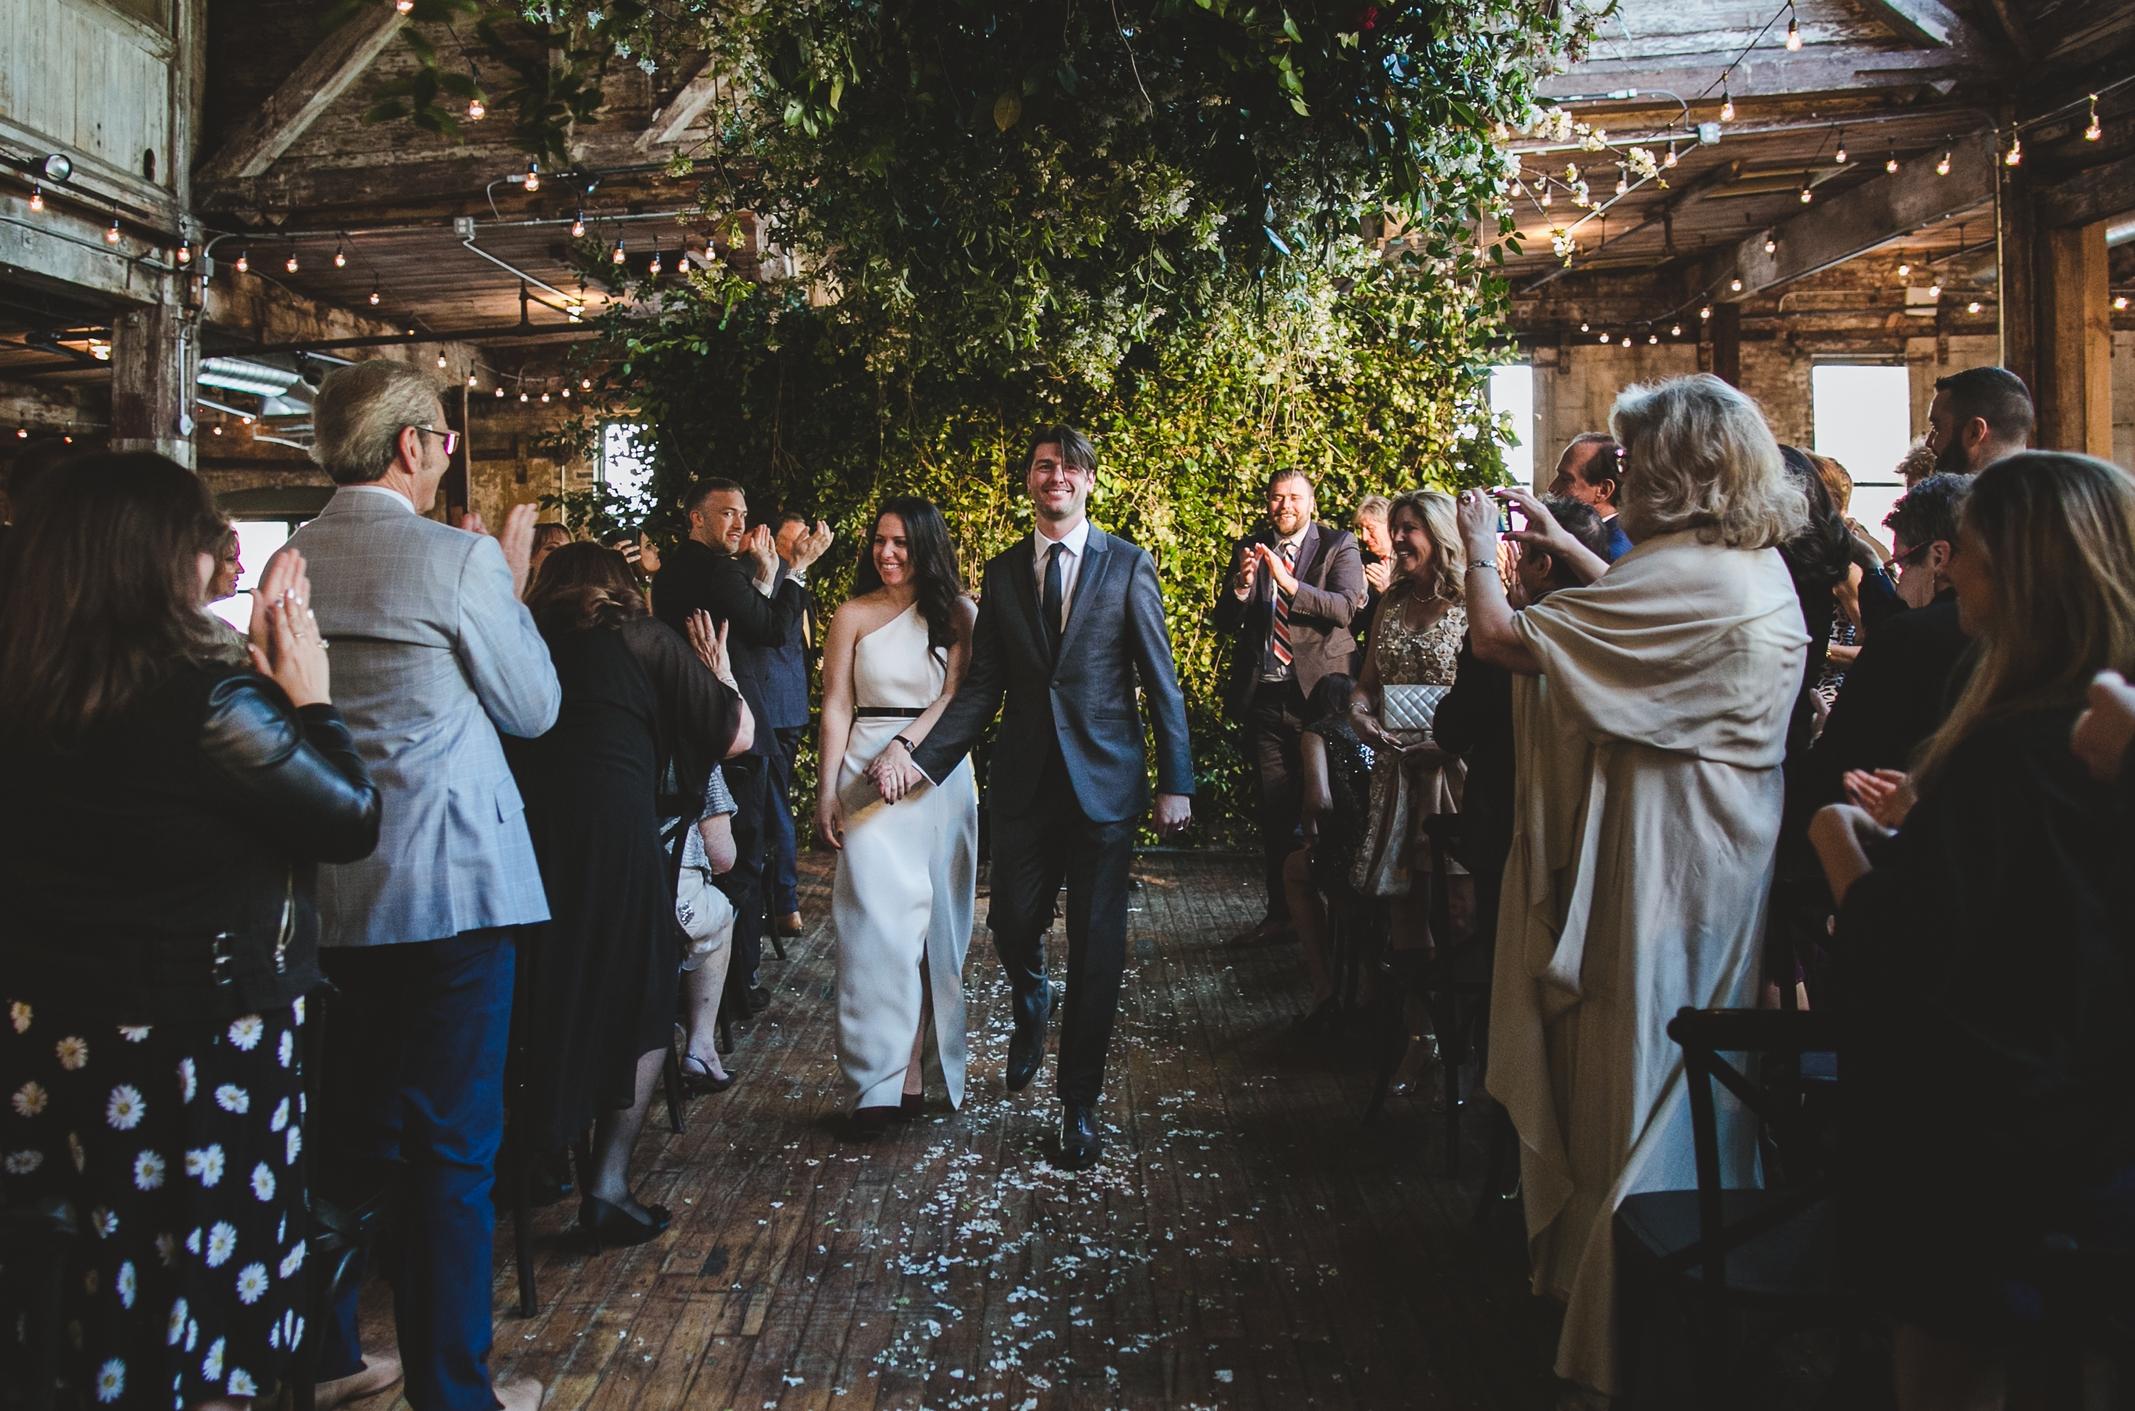 best brooklyn wedding planner jove meyer threw an amazing wedding at greenpoint loft.